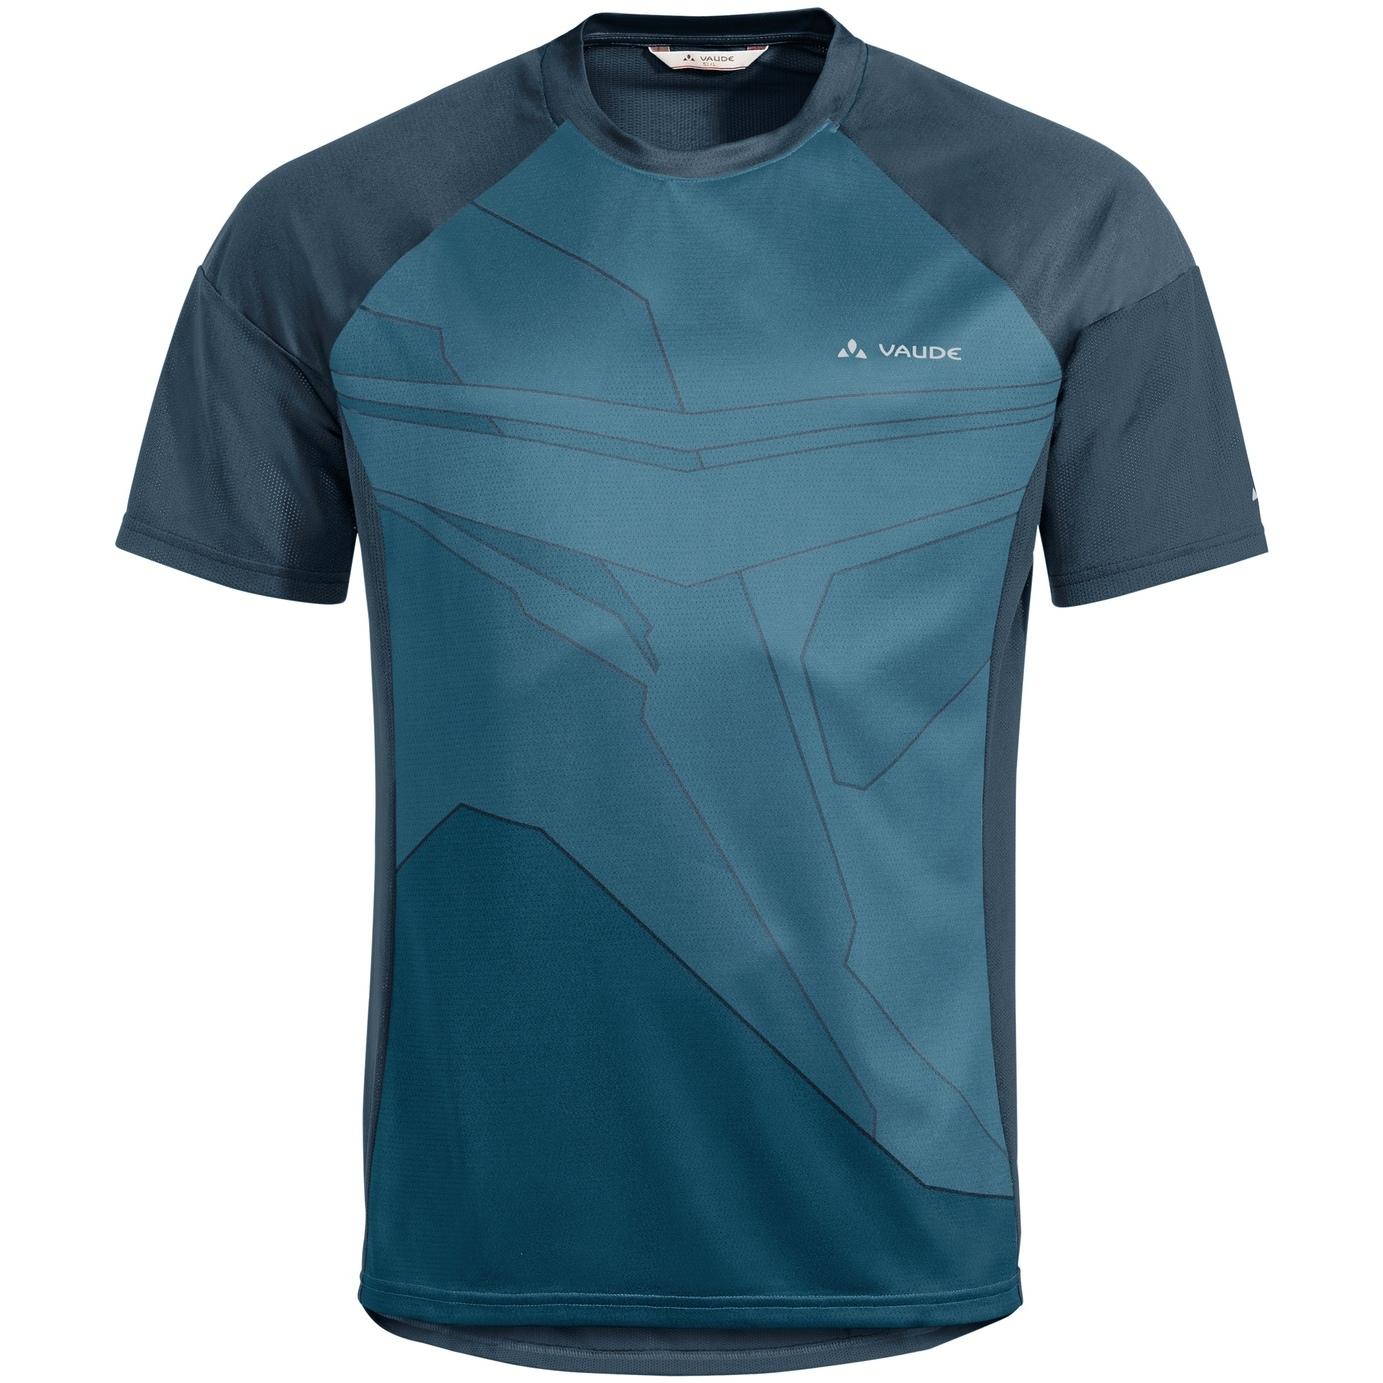 Bild von Vaude Moab T-Shirt VI - blue gray